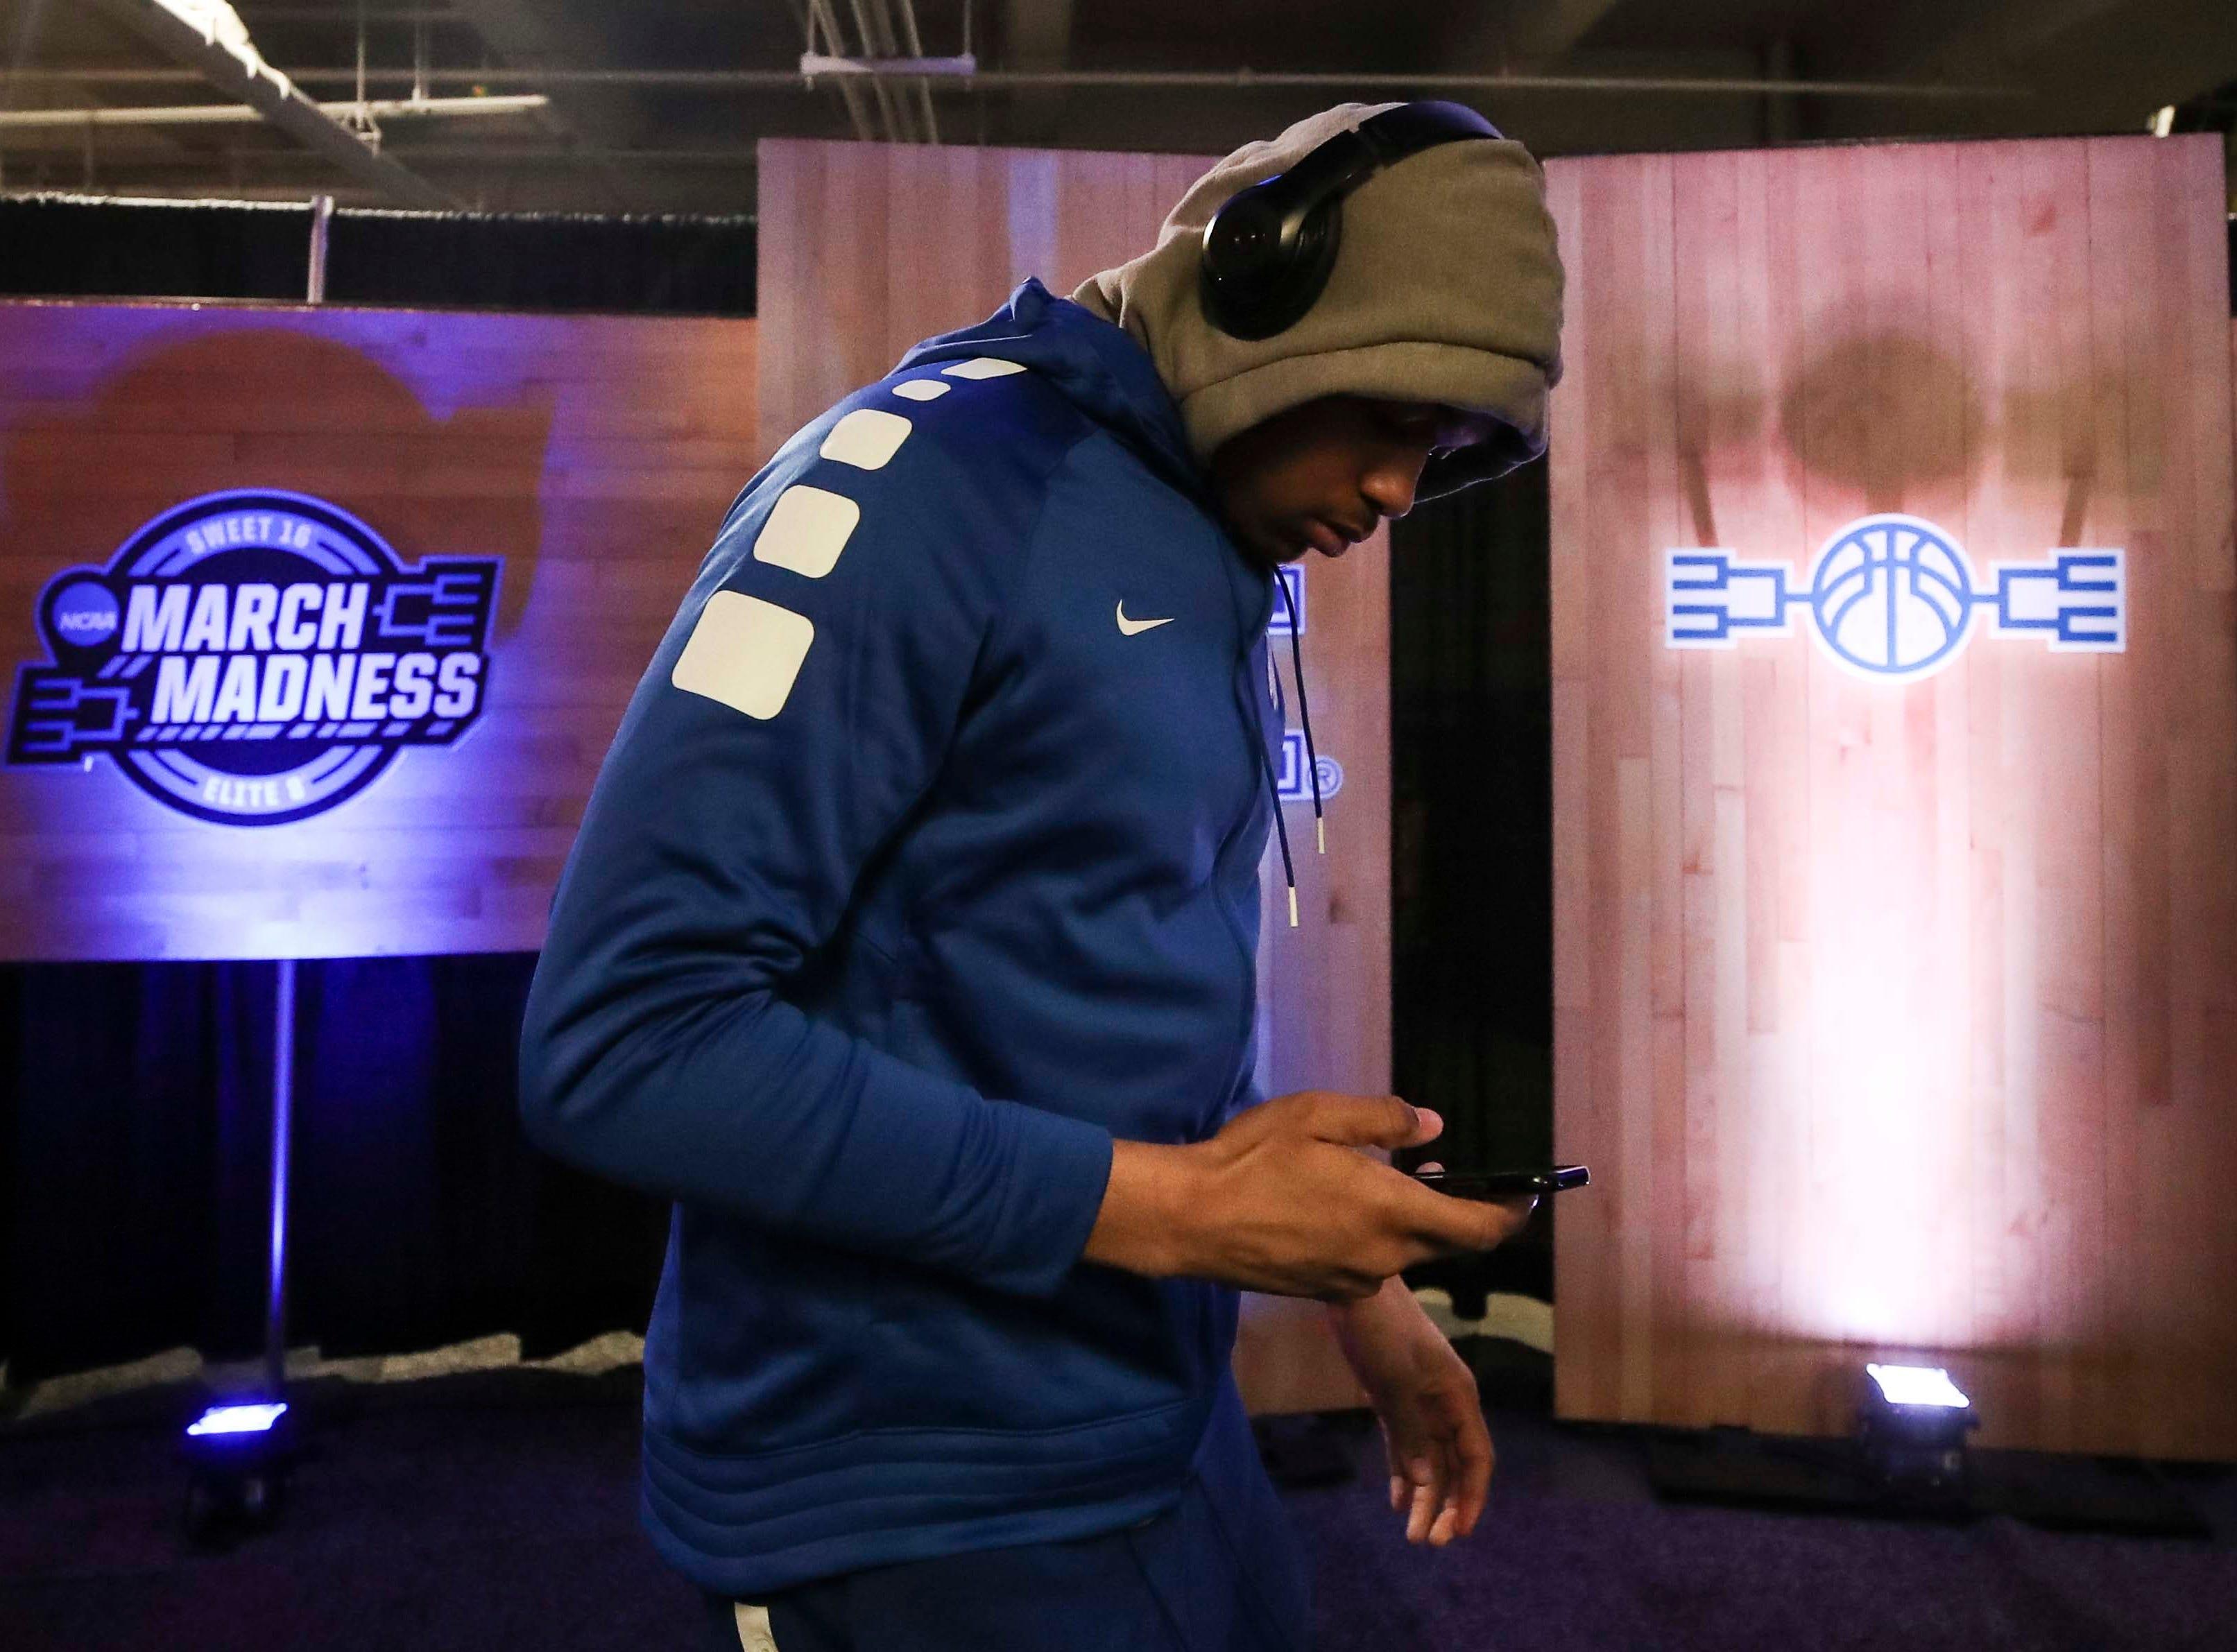 Kentucky player PJ Washington walks towards the locker room at the Sprint Center in Kansas City before game against Auburn. March 31, 2019